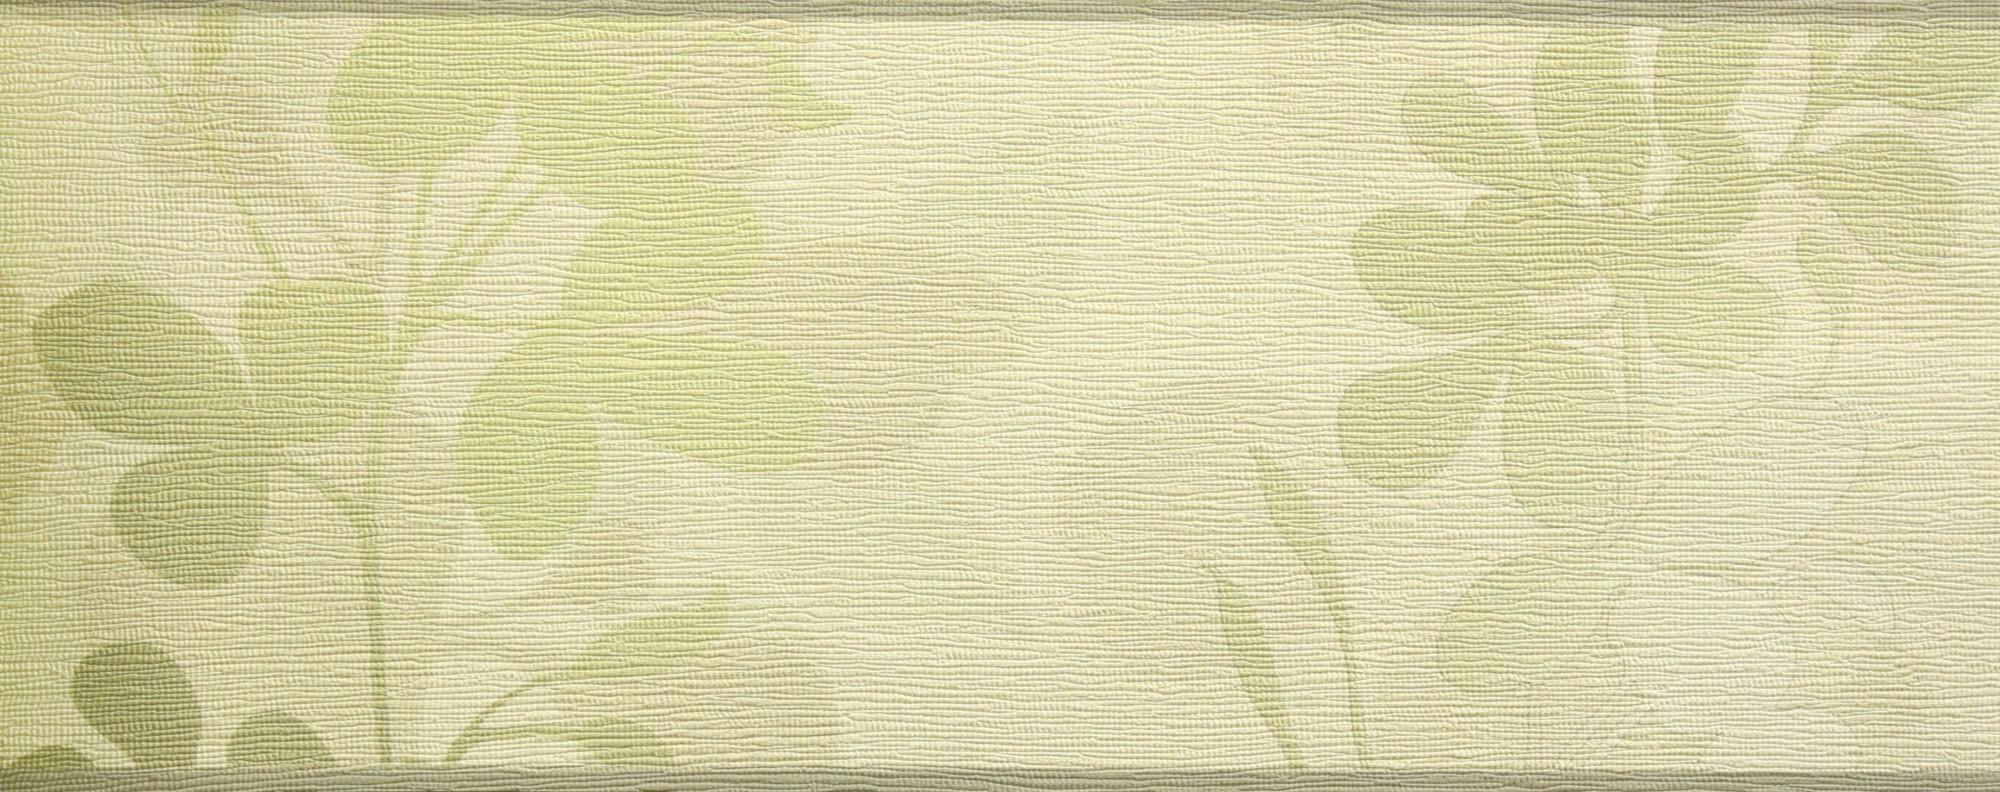 tapete rasch seduction 2014 borte 796759 ranke creme gr n ebay. Black Bedroom Furniture Sets. Home Design Ideas